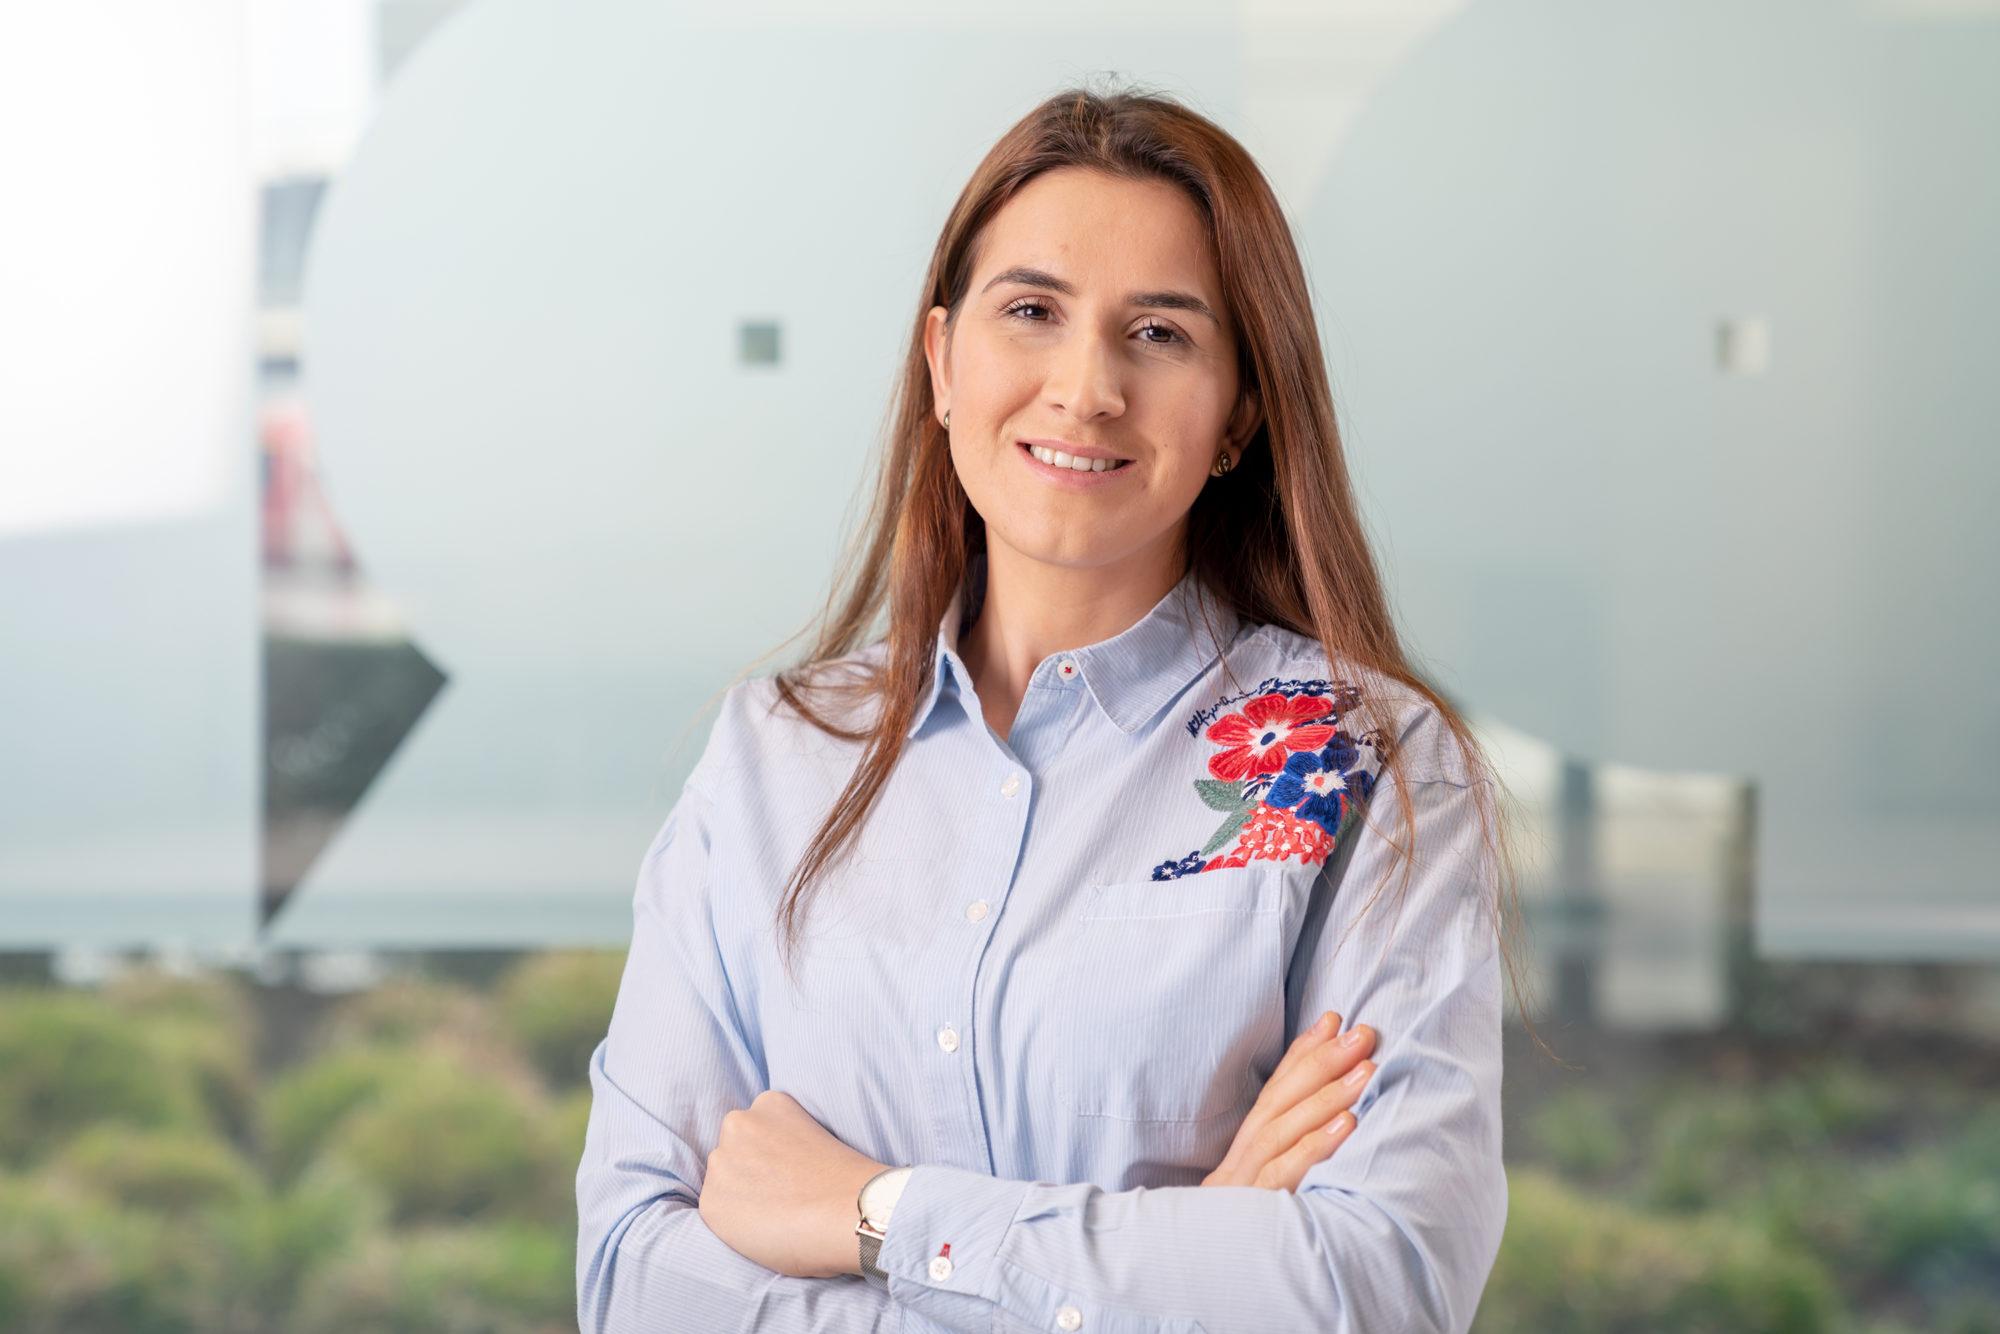 Velerda Bauta, Betriebsleiterin